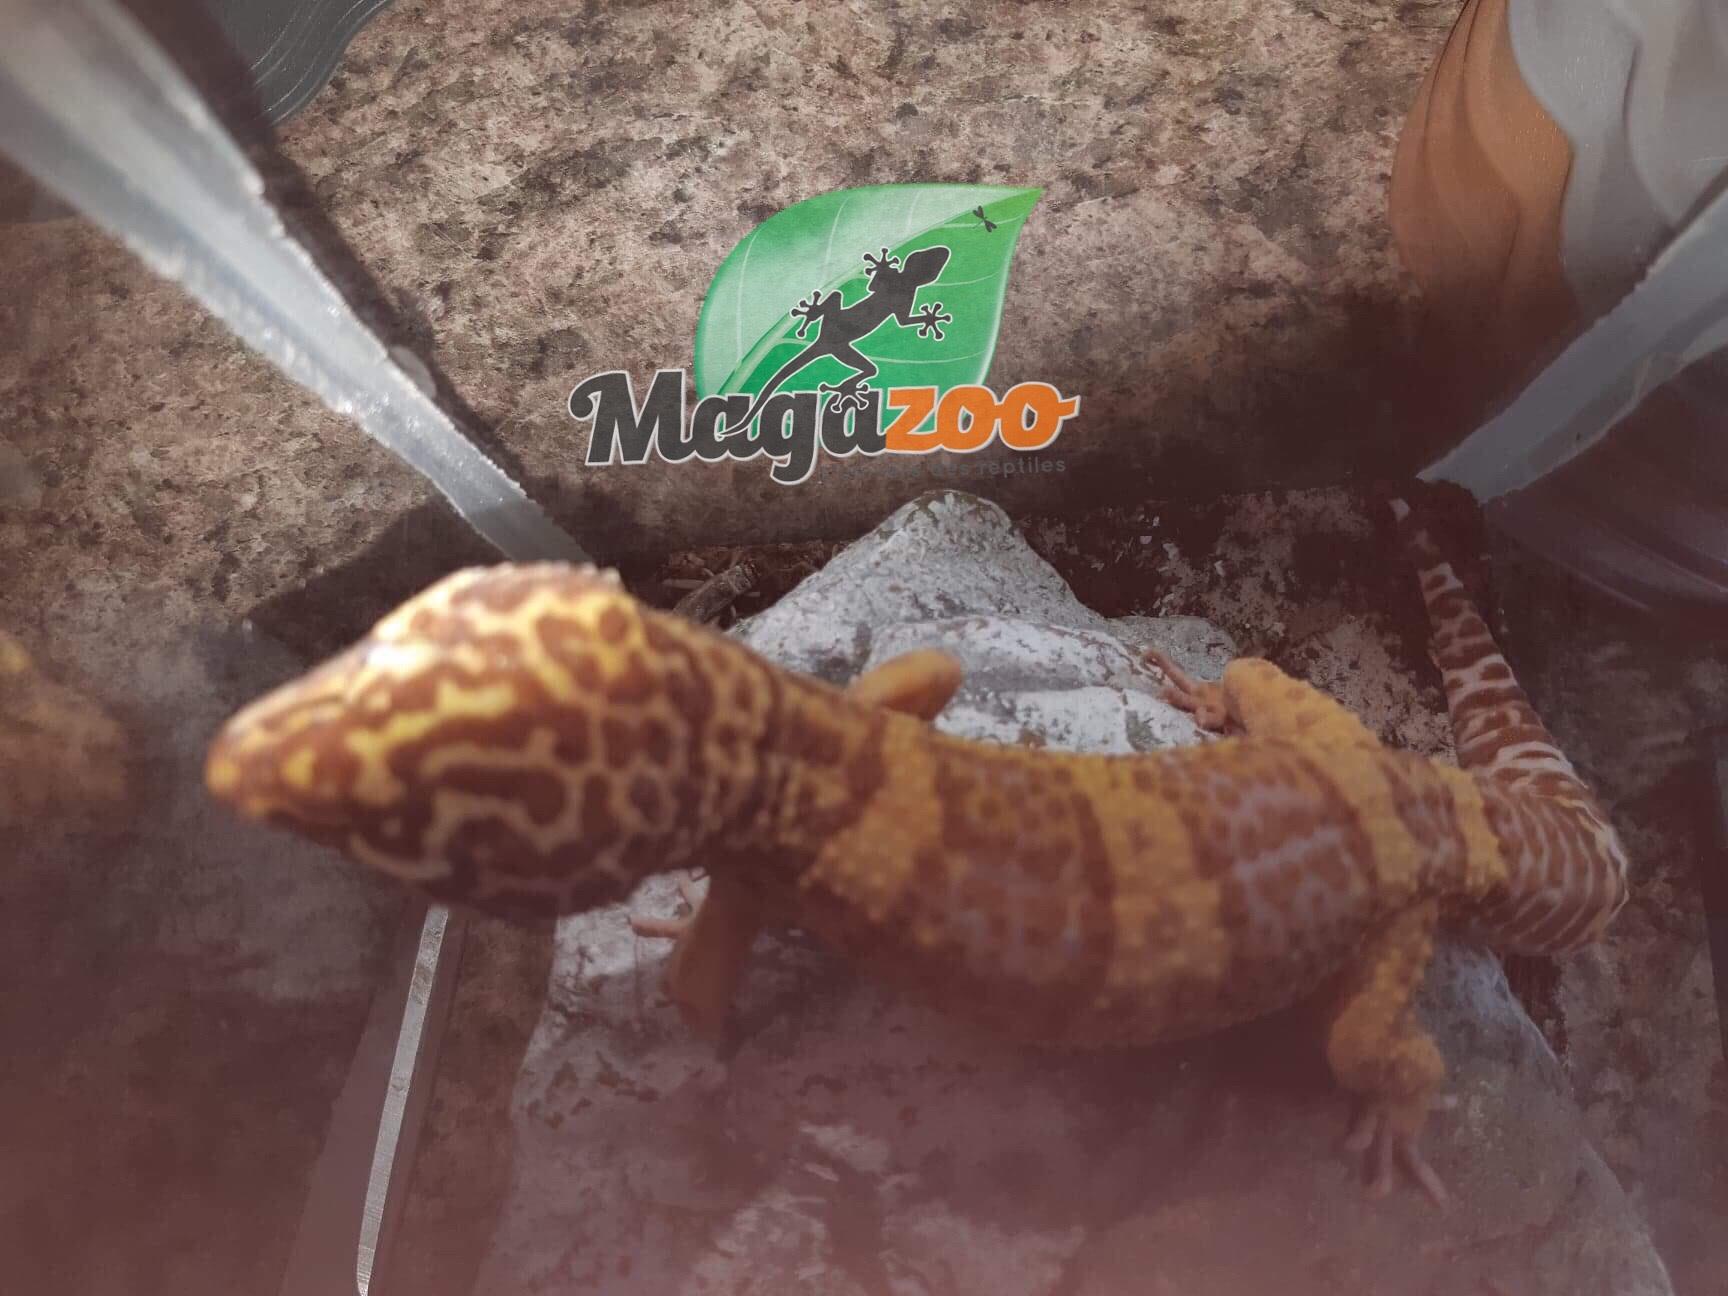 Magazoo Gecko Léopard Mack Snow Tremper Albino Mâle